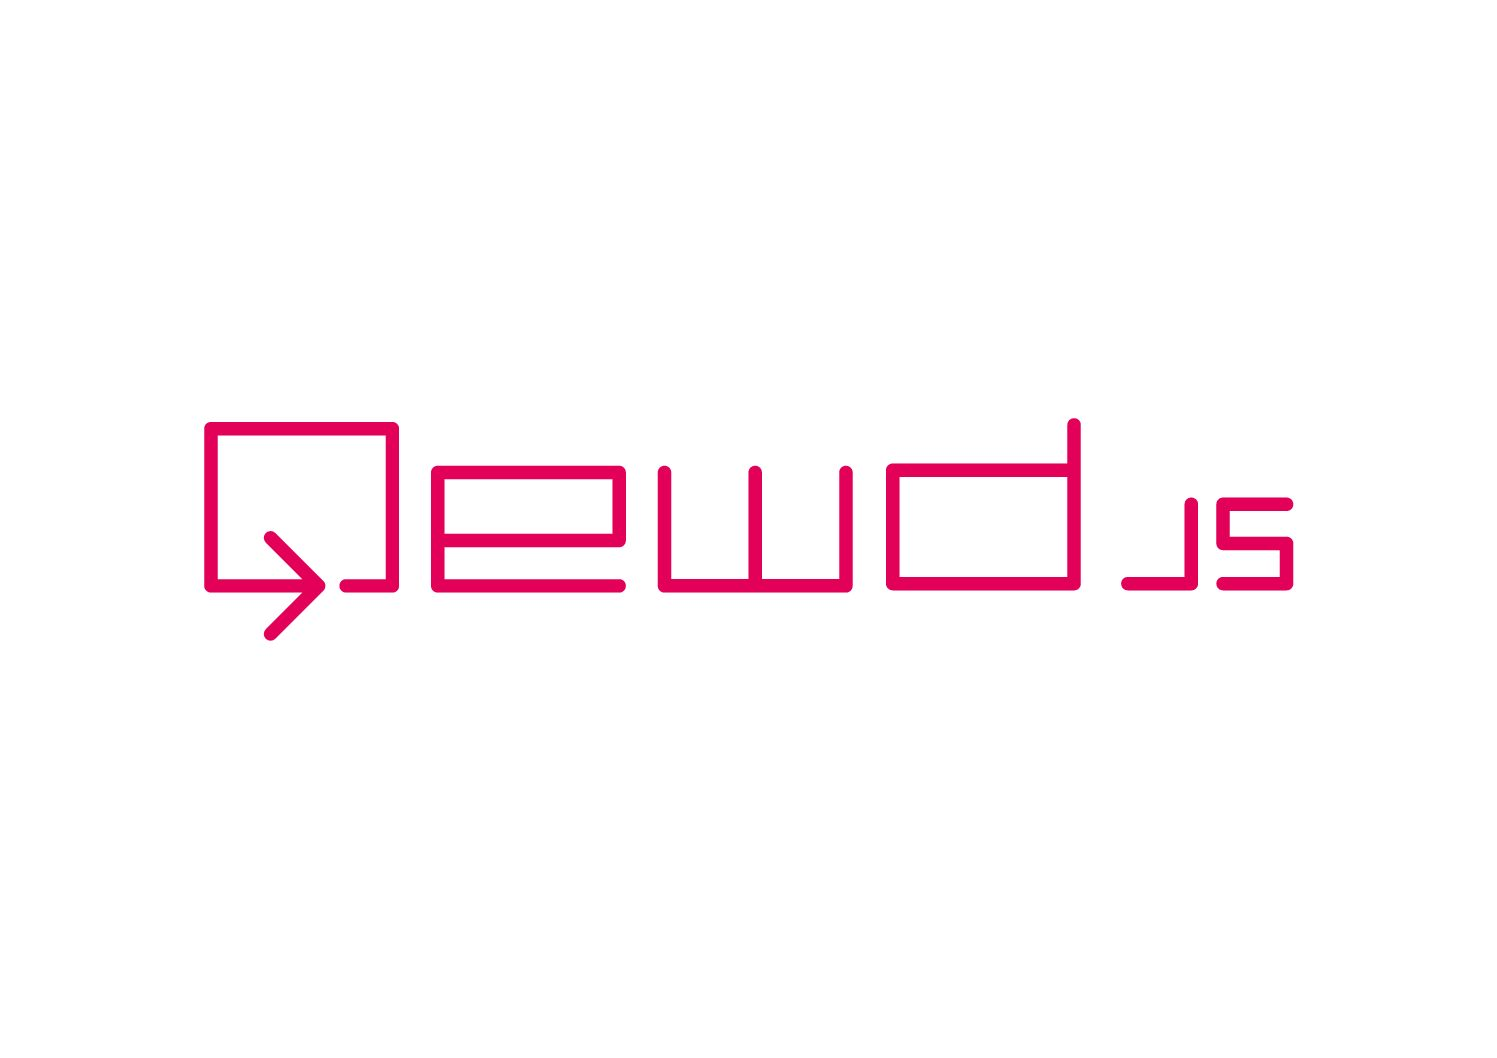 Qewd_logo_stack